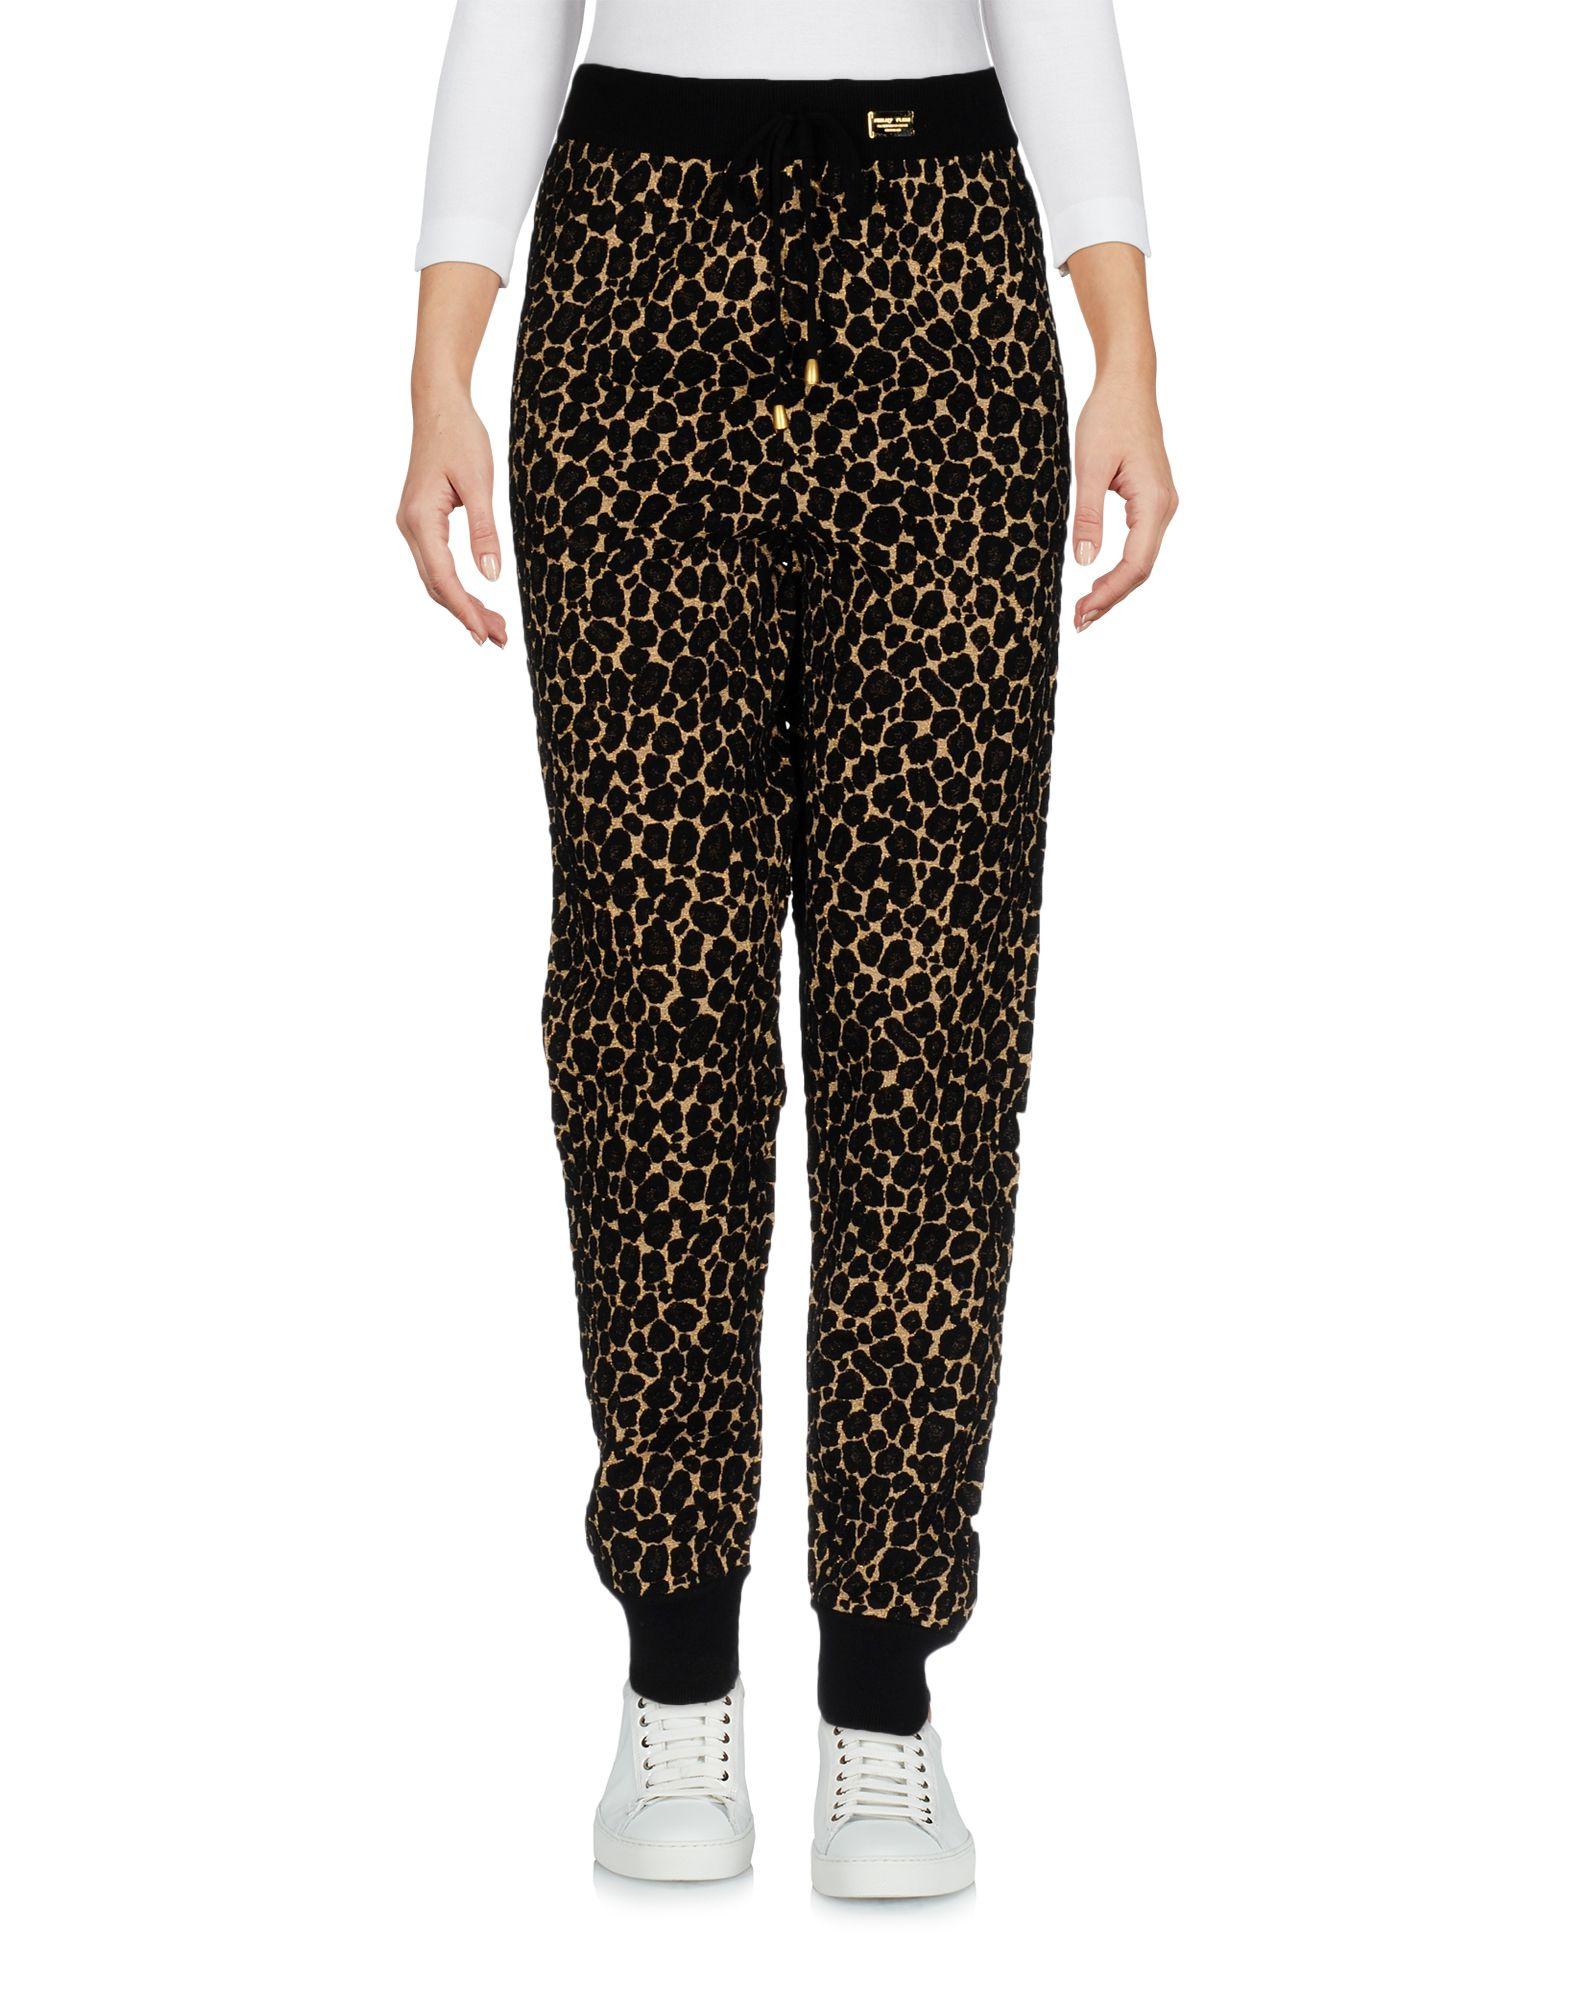 Pantalone Philipp Plein Donna - Acquista online su jGxYzoiT1